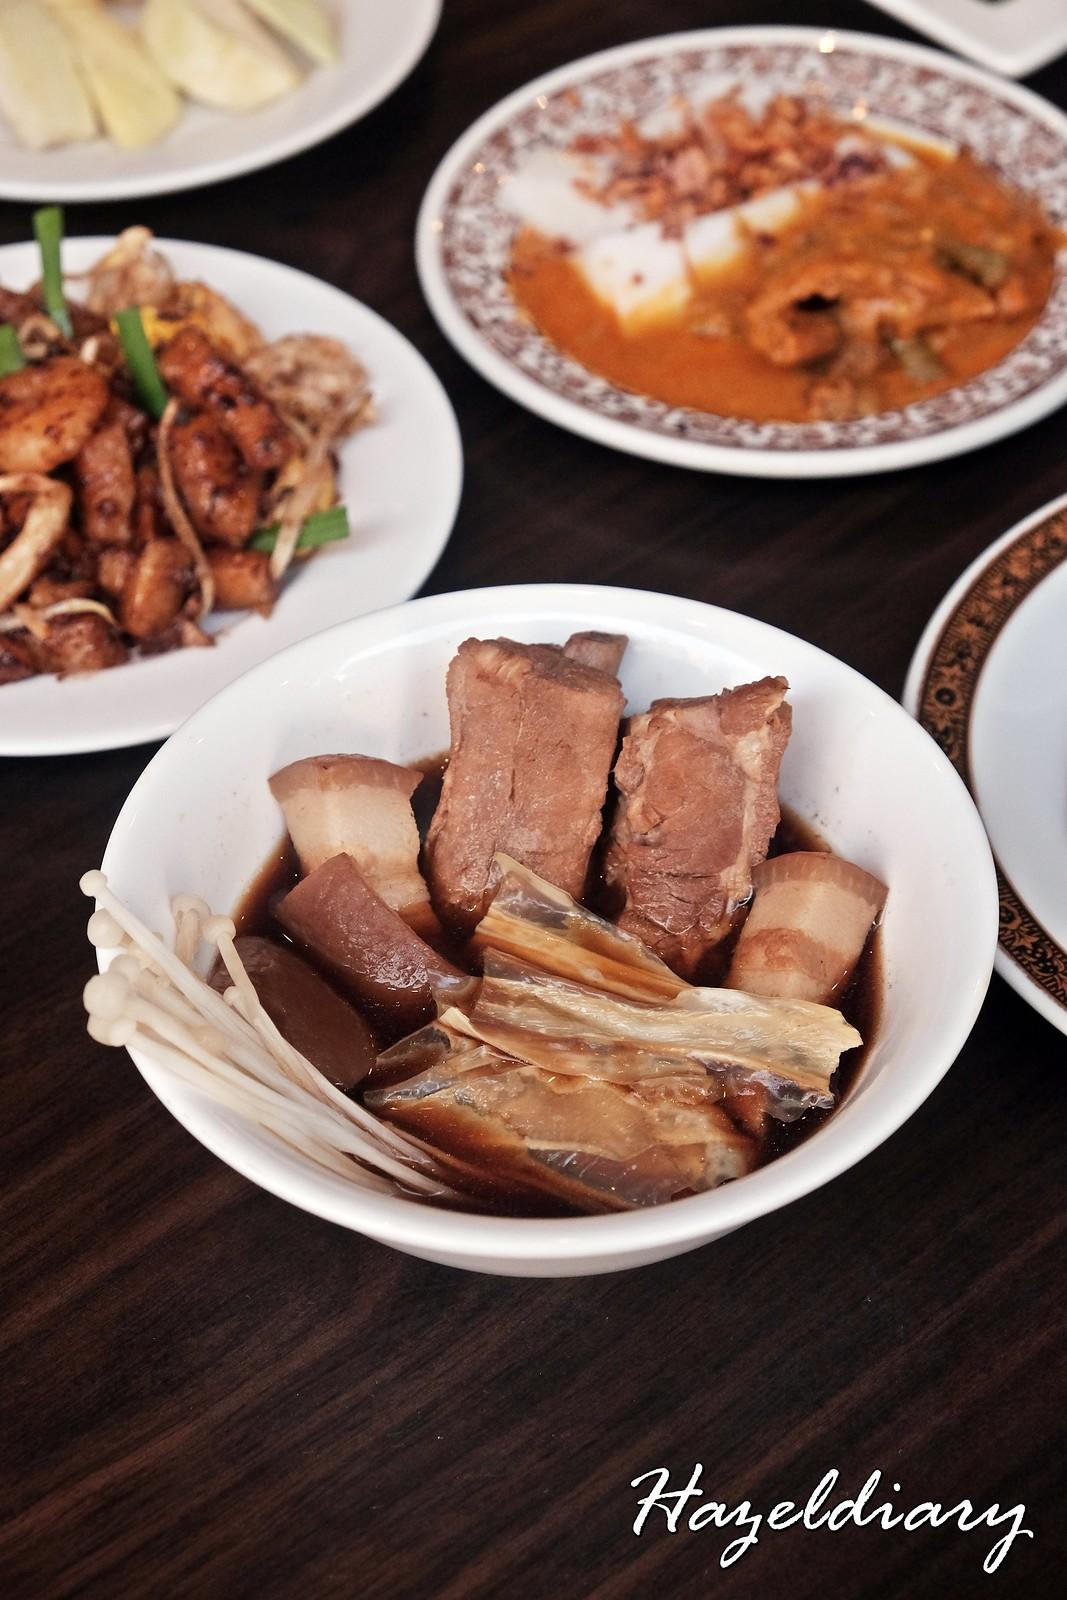 Klang Bak Kut Teh-White Rose Cafe York Hotel